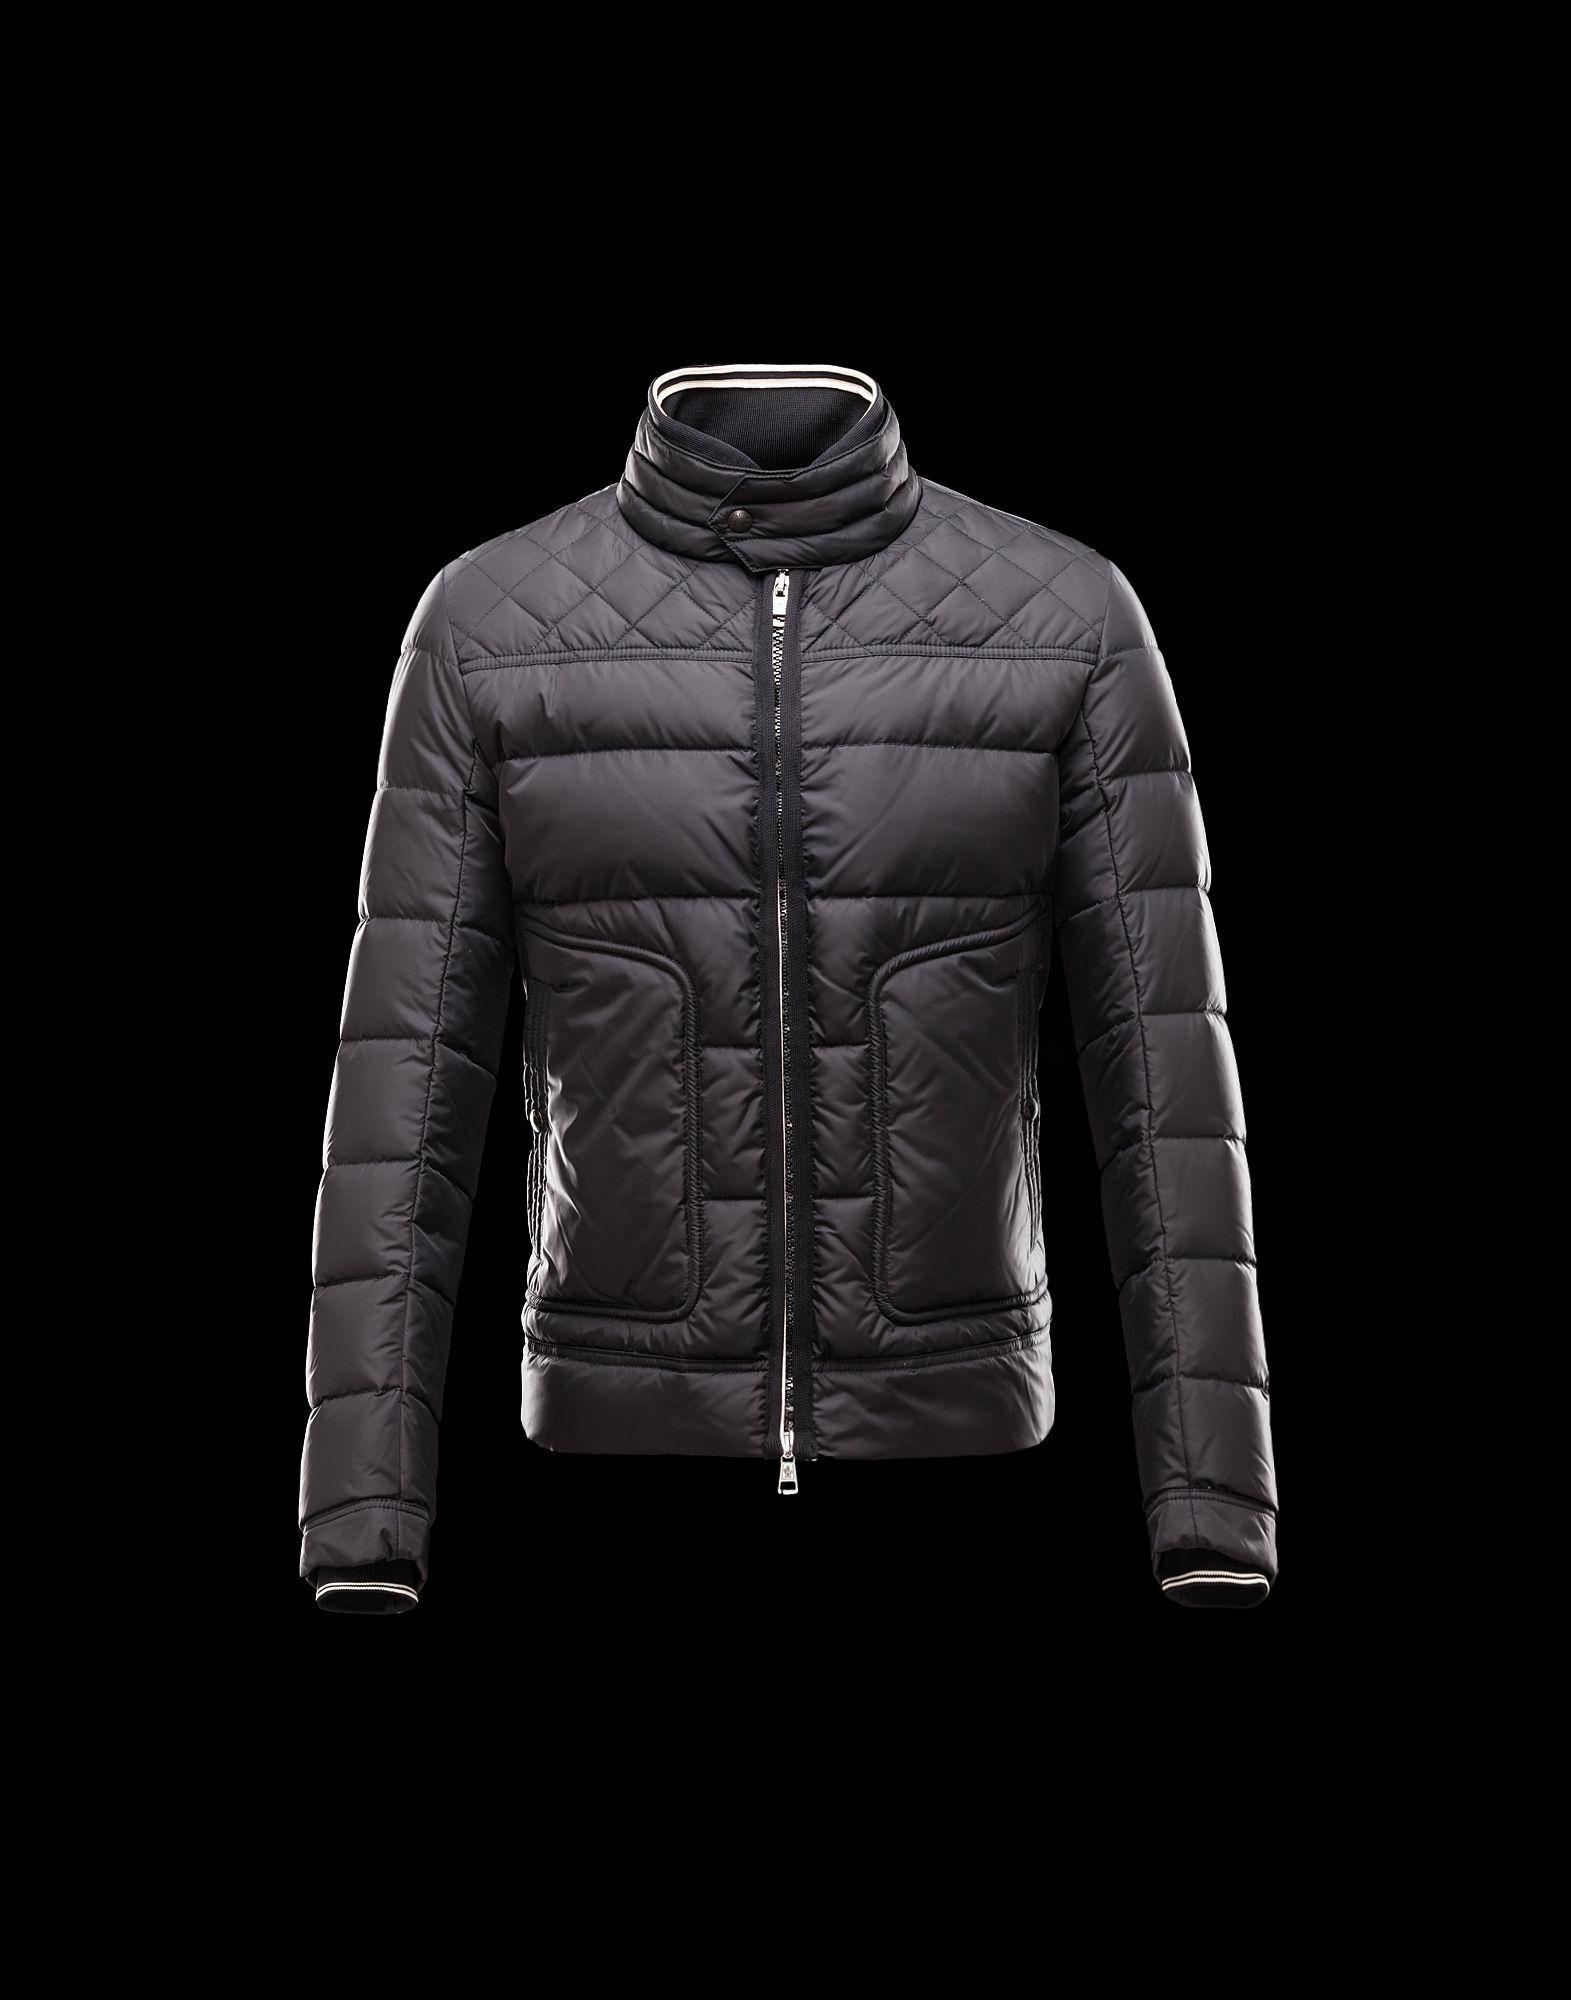 Jacket Men Outerwear Men on Moncler Online Store